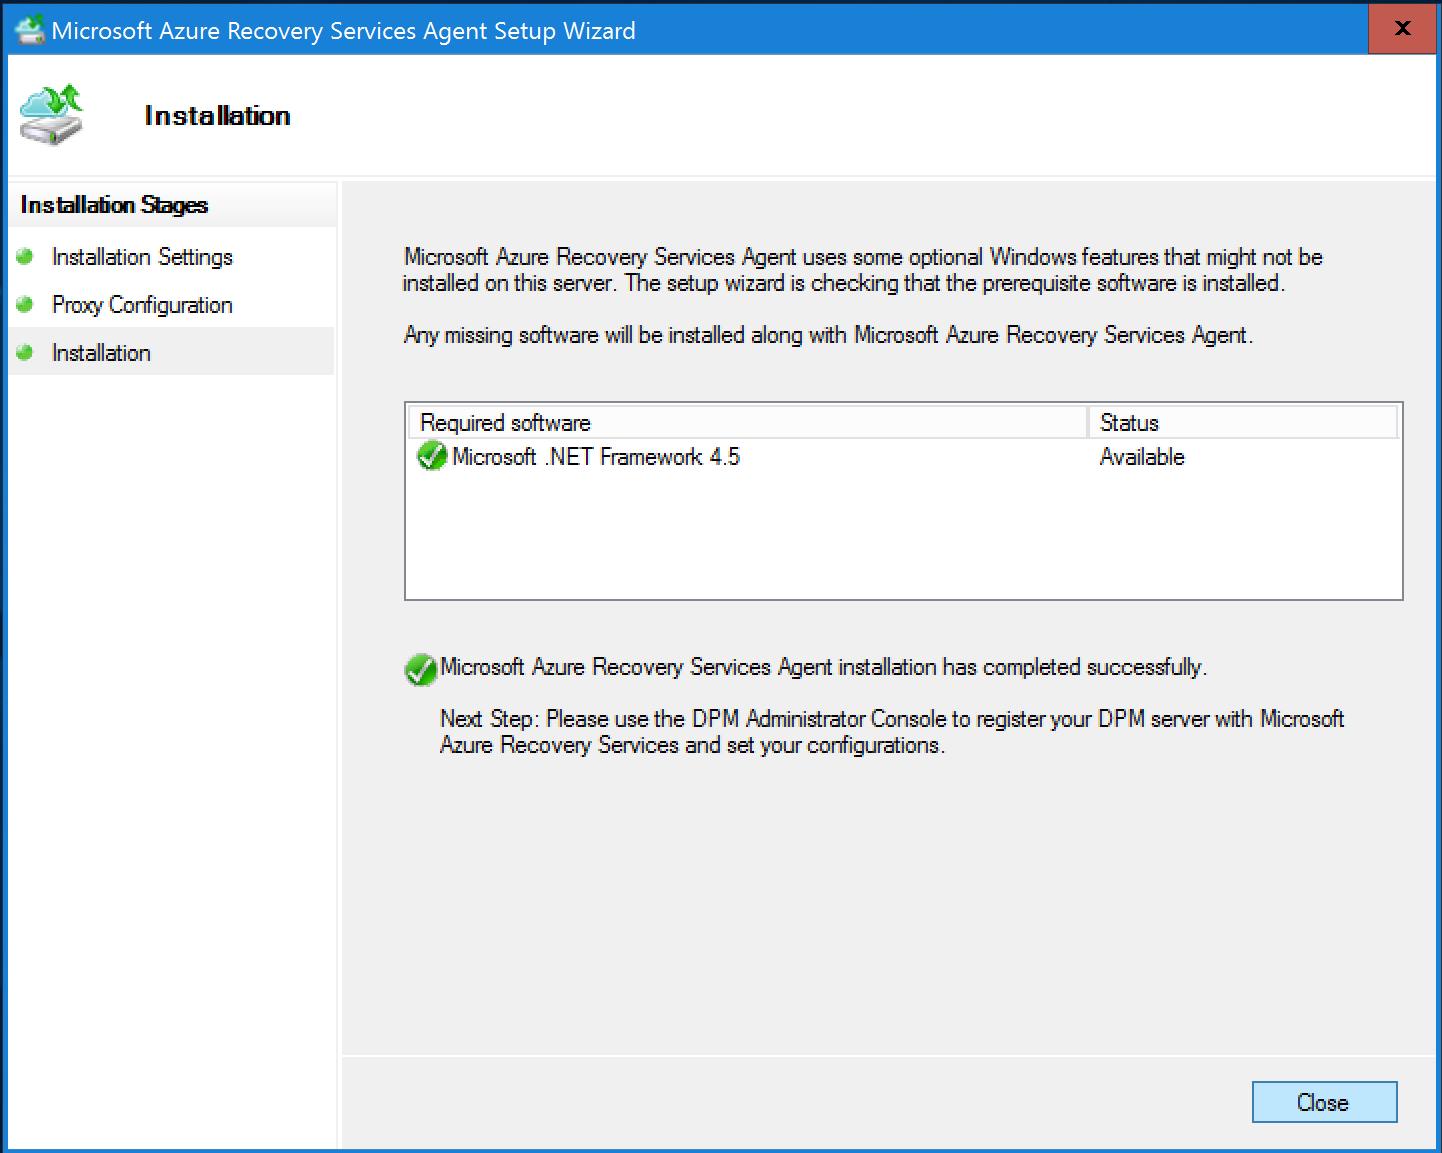 Use DPM to back up workloads to Azure portal | Microsoft Docs